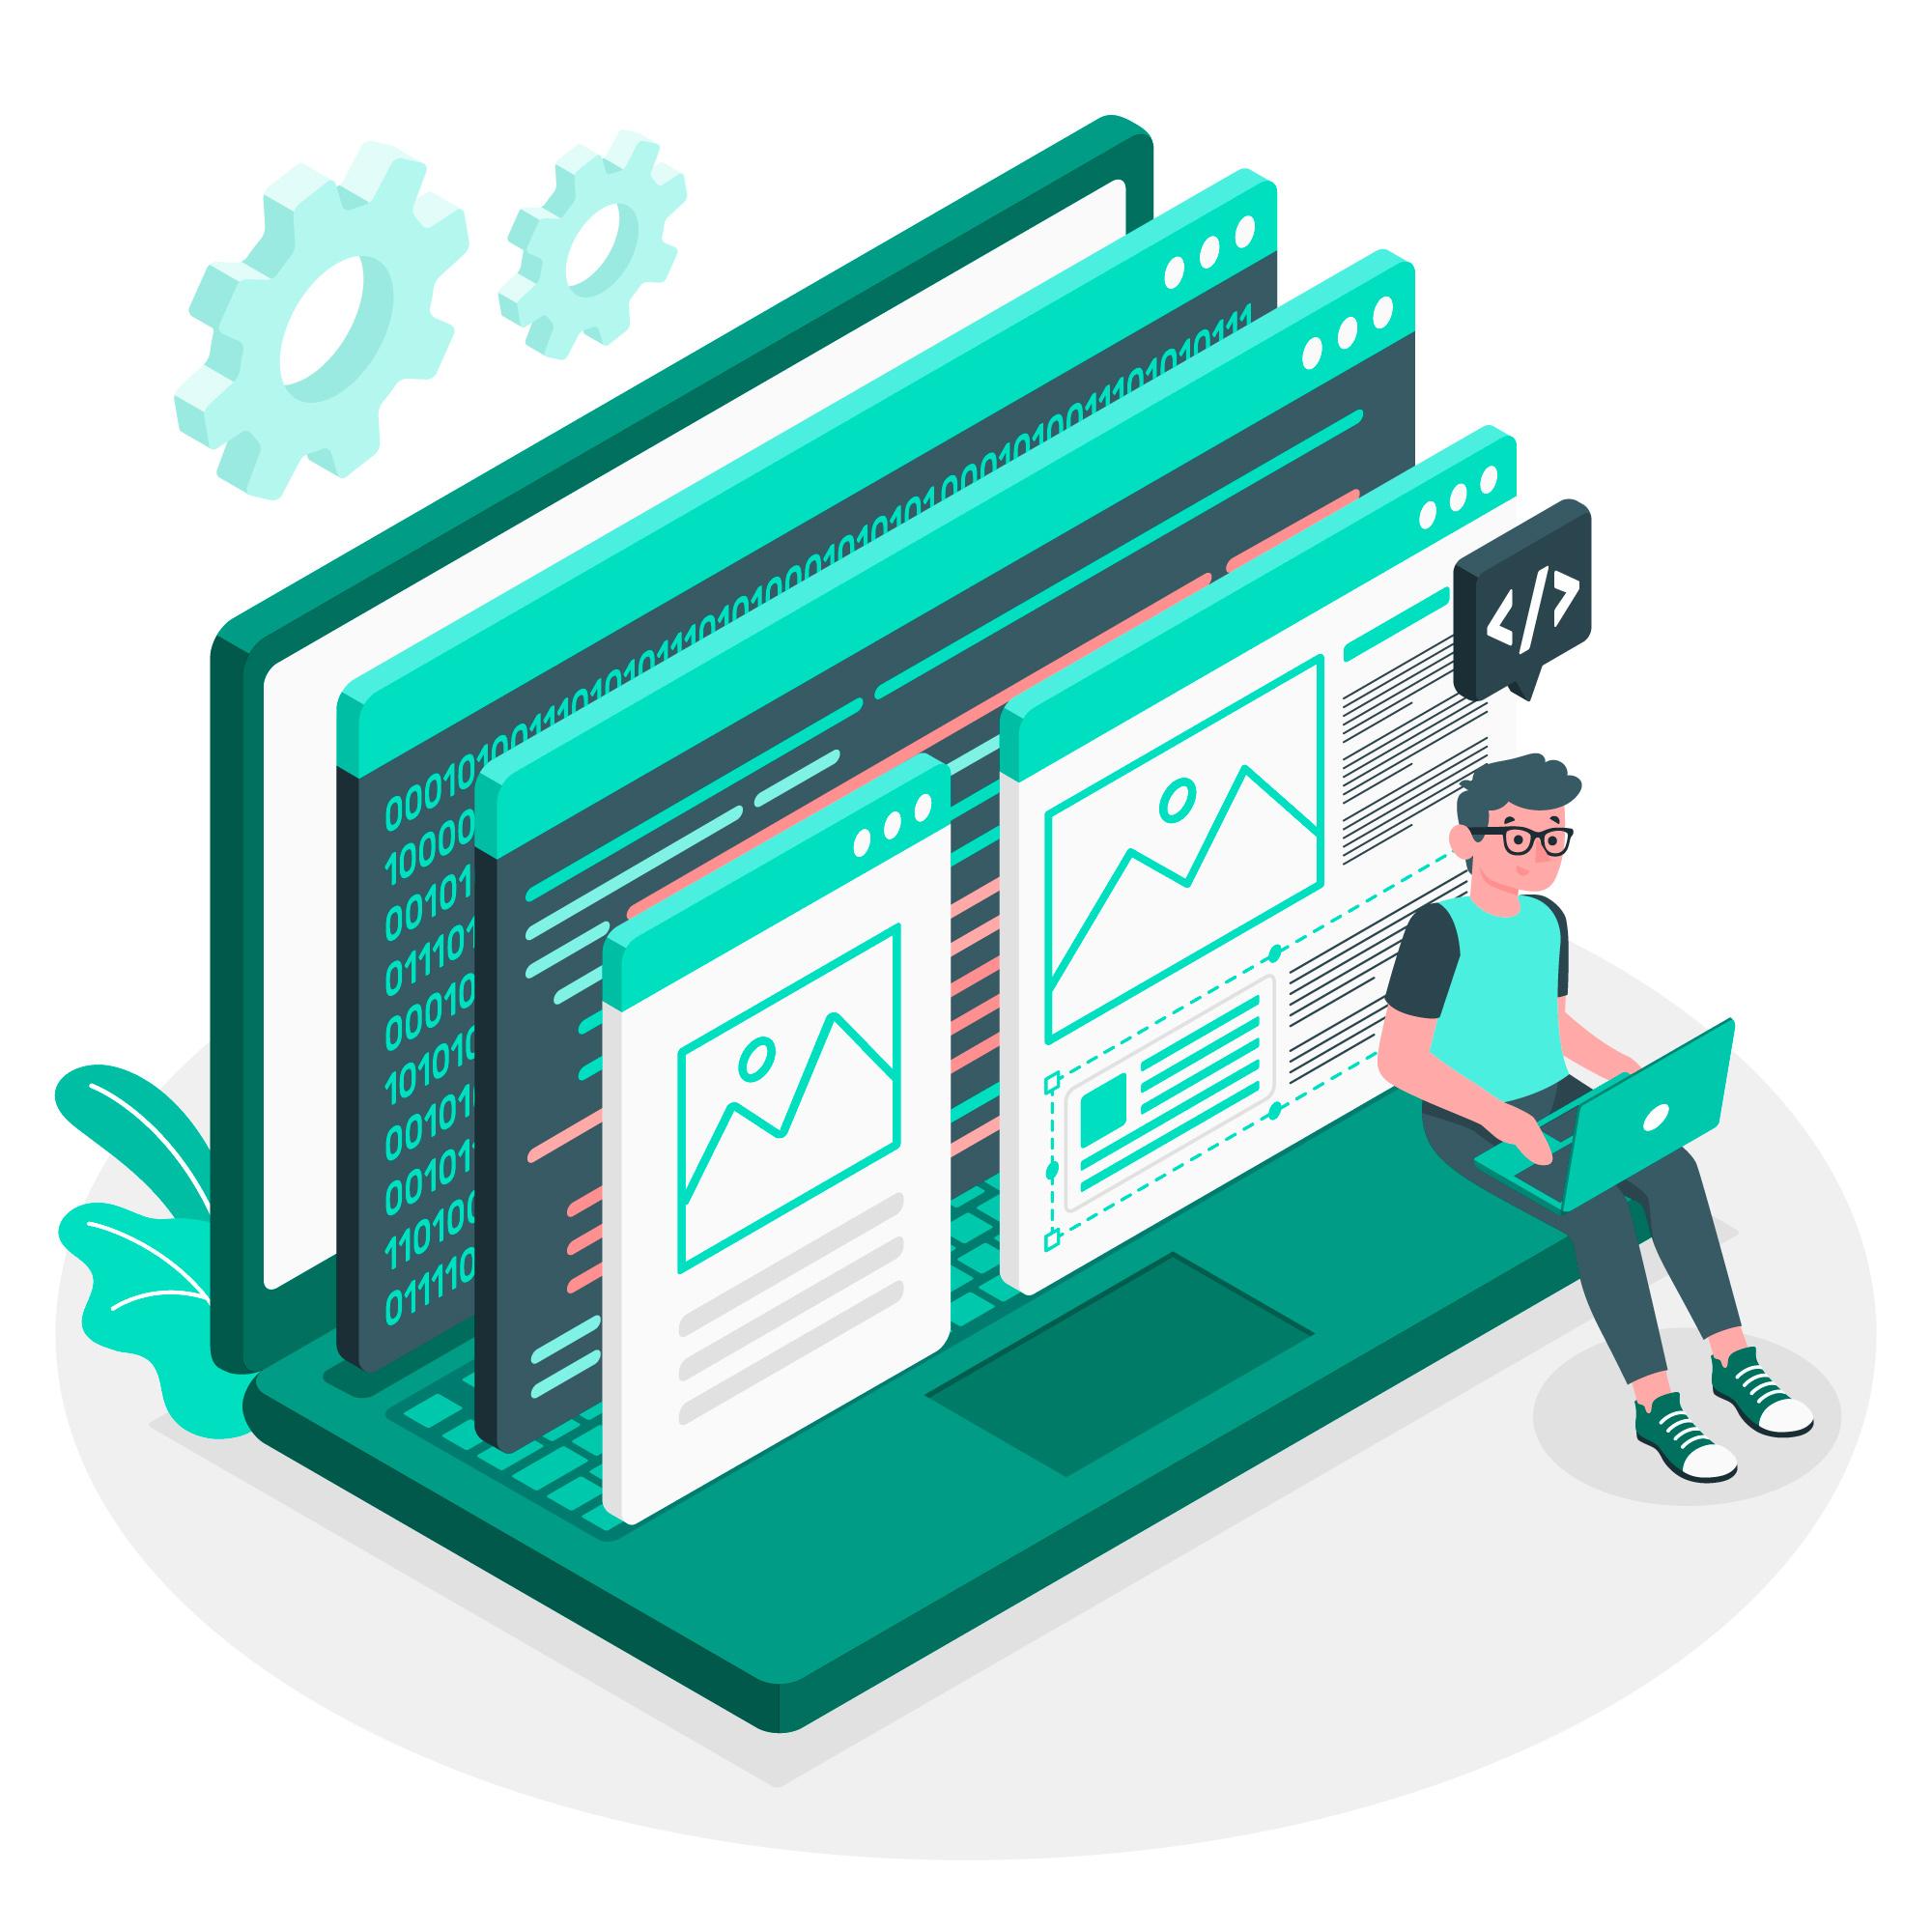 https://www.veribel.com.tr/wp-content/uploads/2021/01/systems-integration.jpg